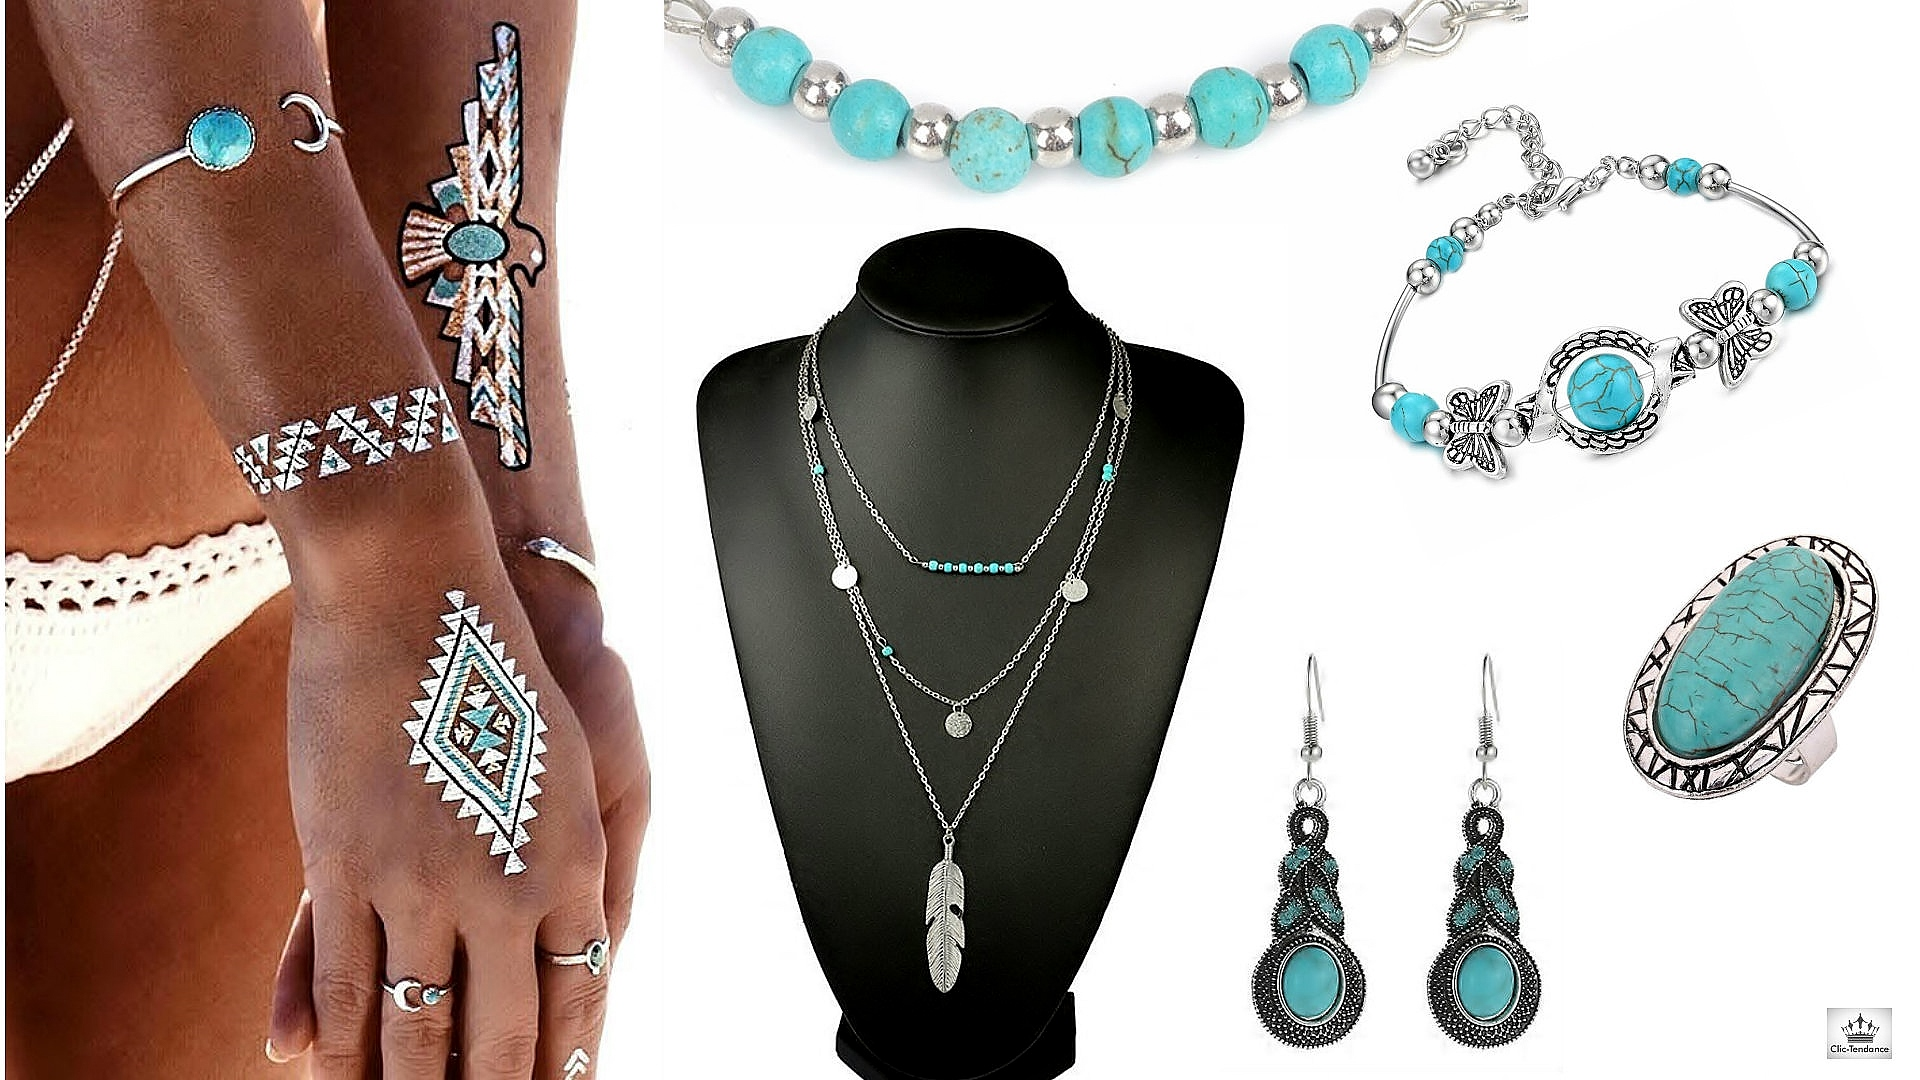 Bijoux Fantaisie femme style etnique boheme et gipsy